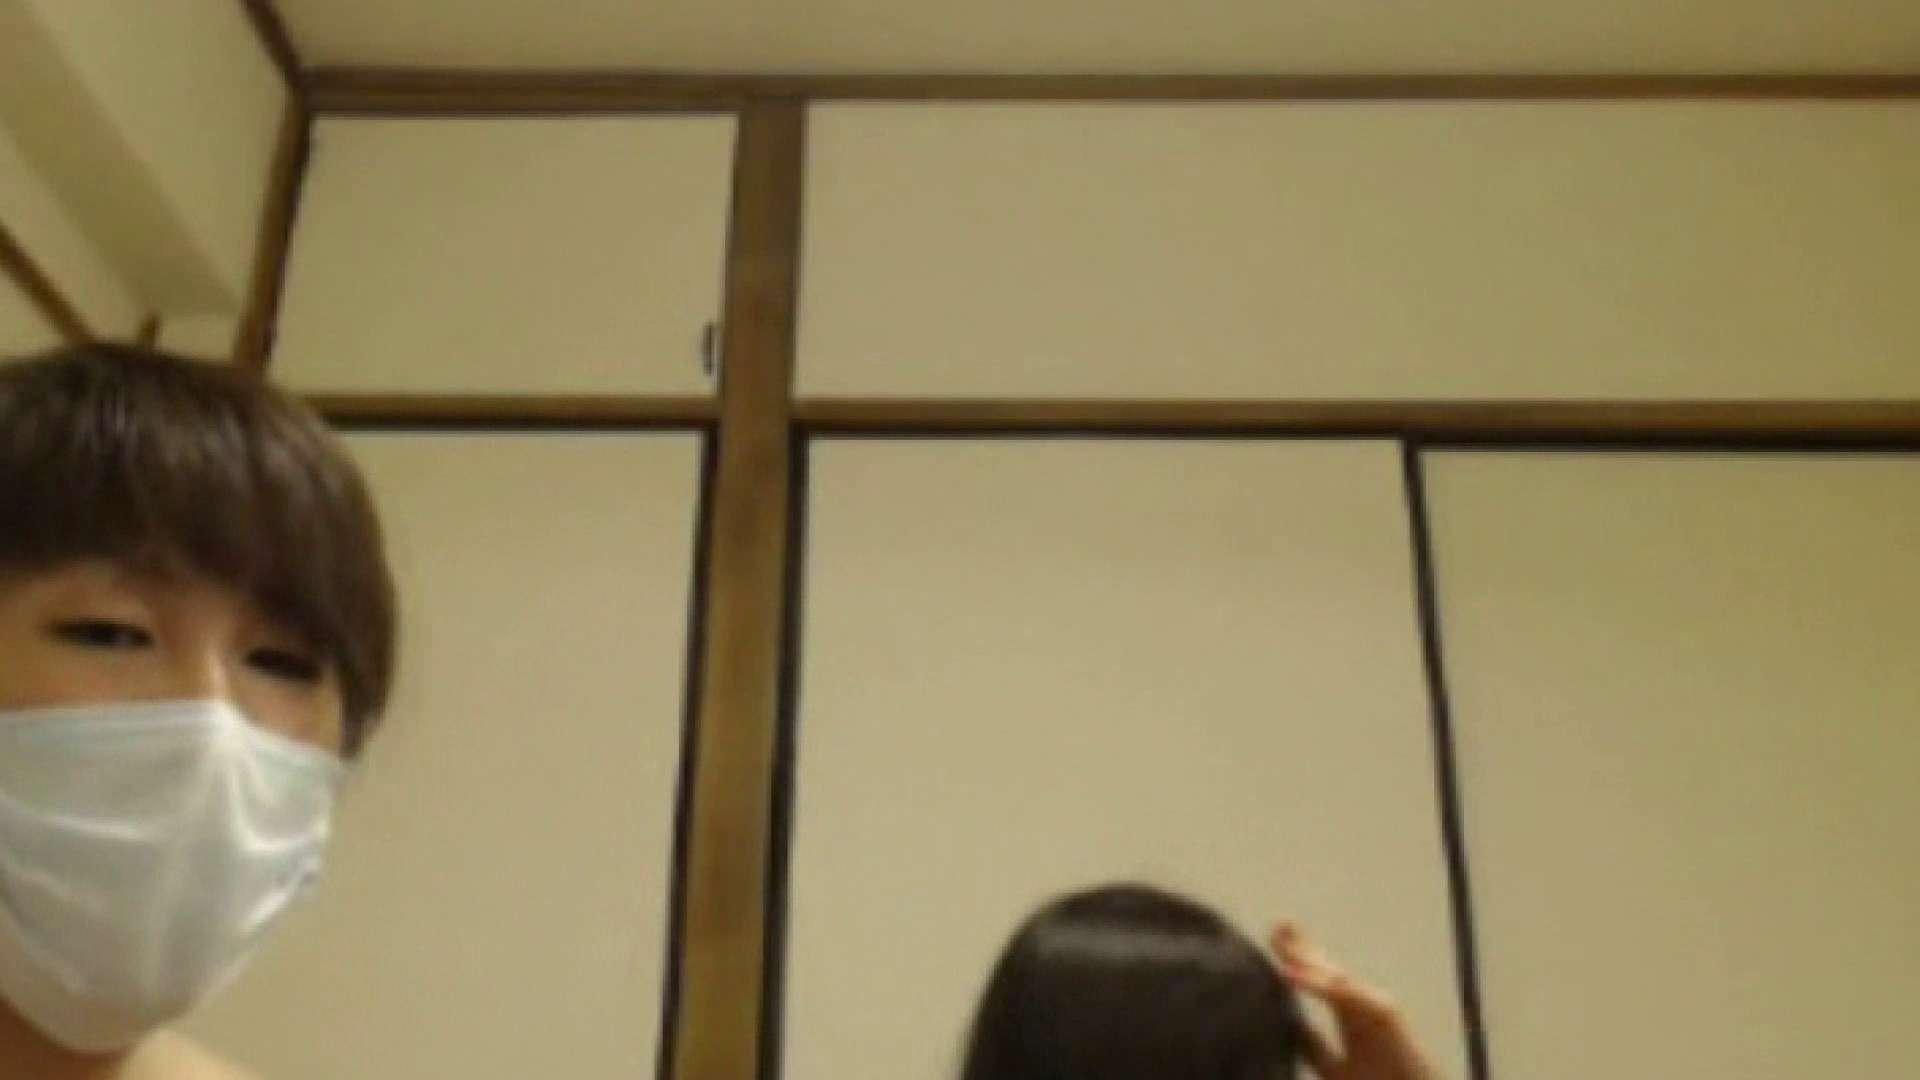 S級ギャルのハメ撮り!生チャット!Vol.21前編 美女まとめ セックス無修正動画無料 108PIX 26